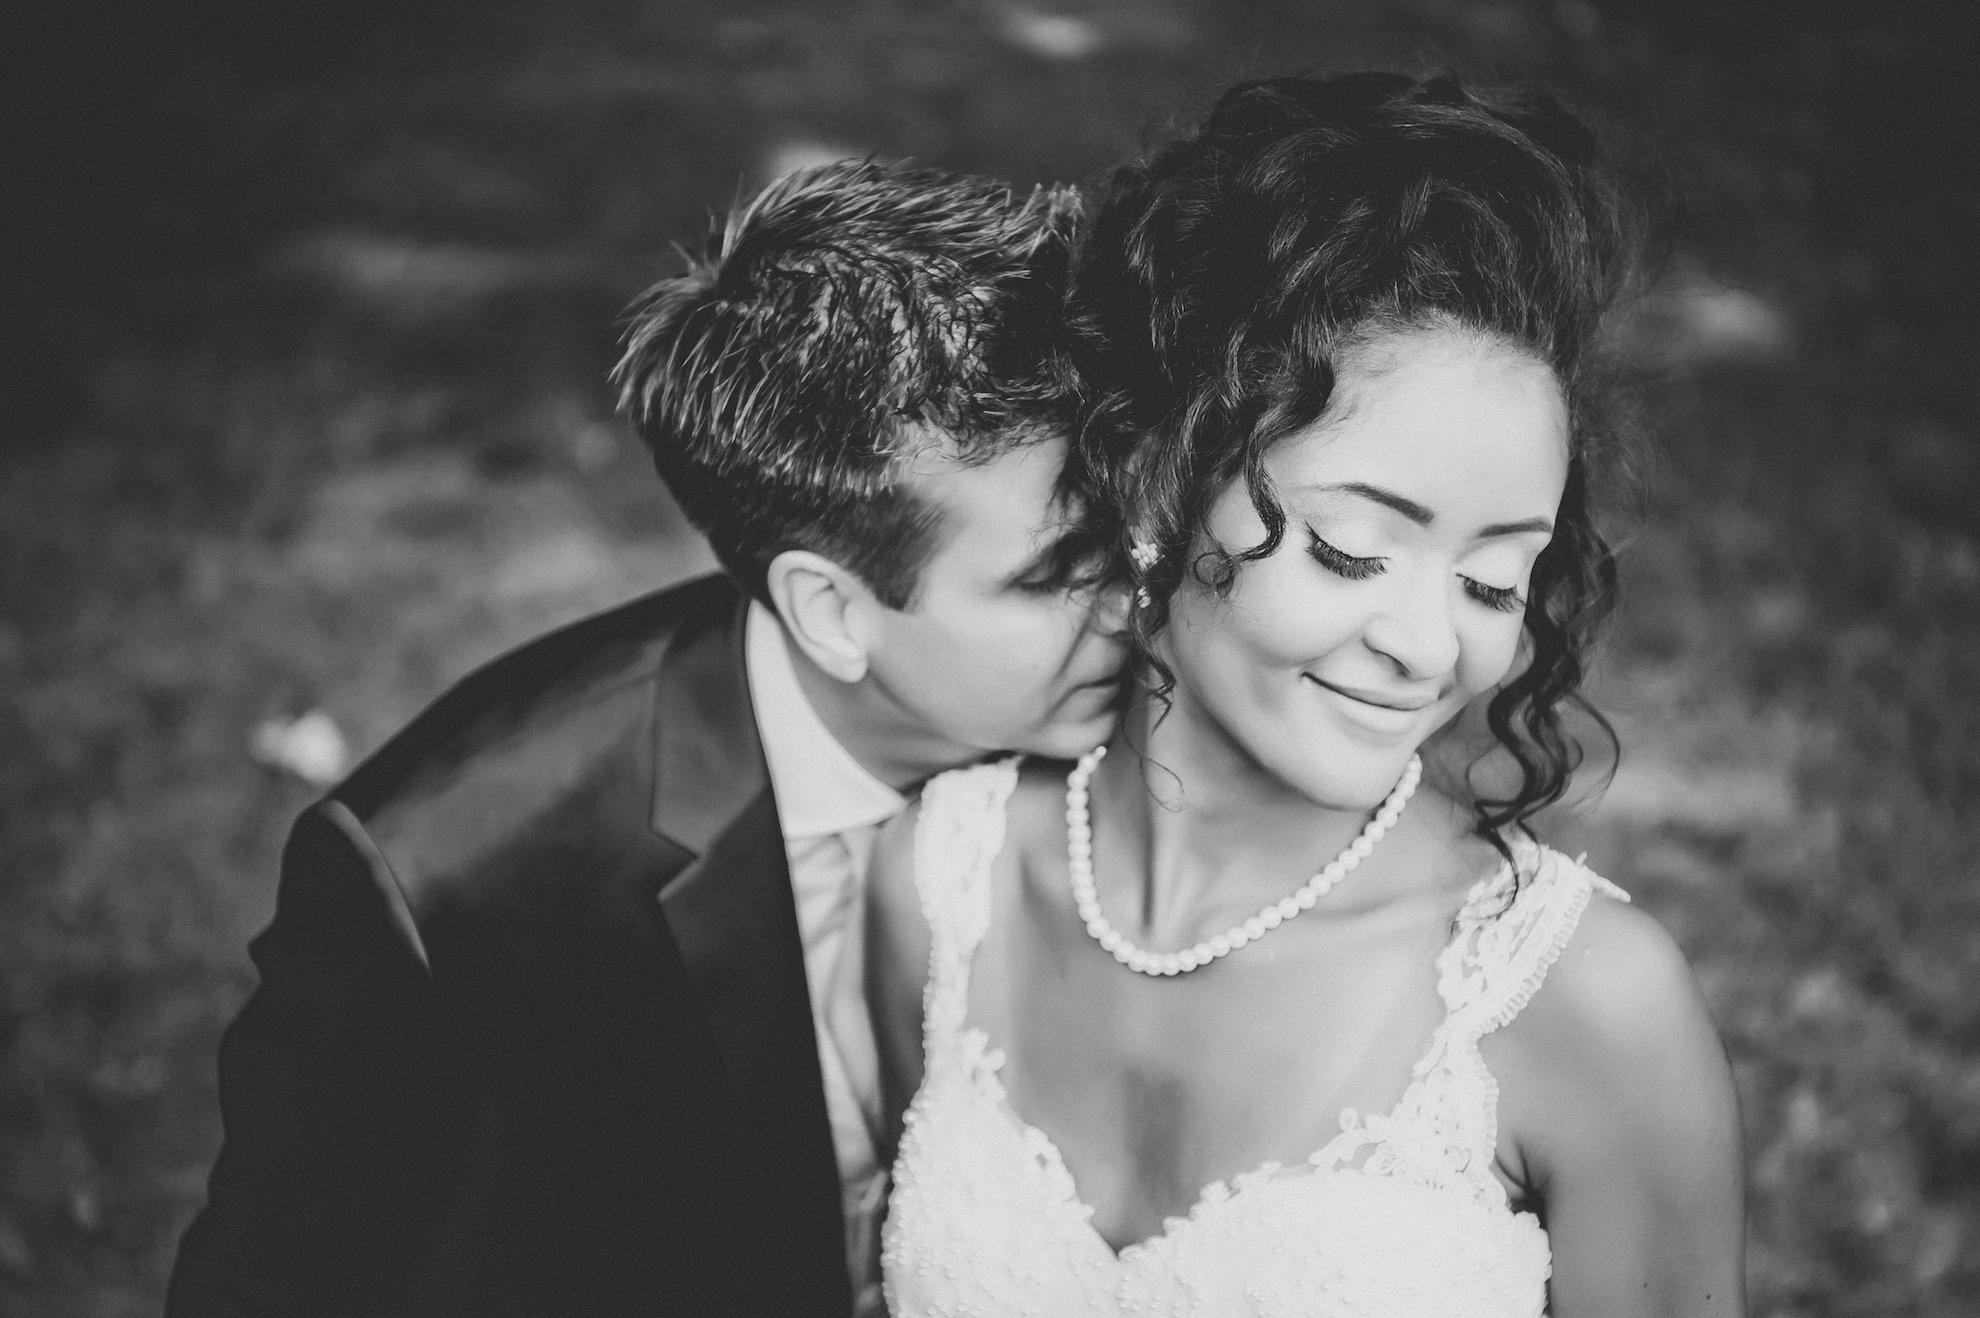 Brautpaarfotoshooting.jpg